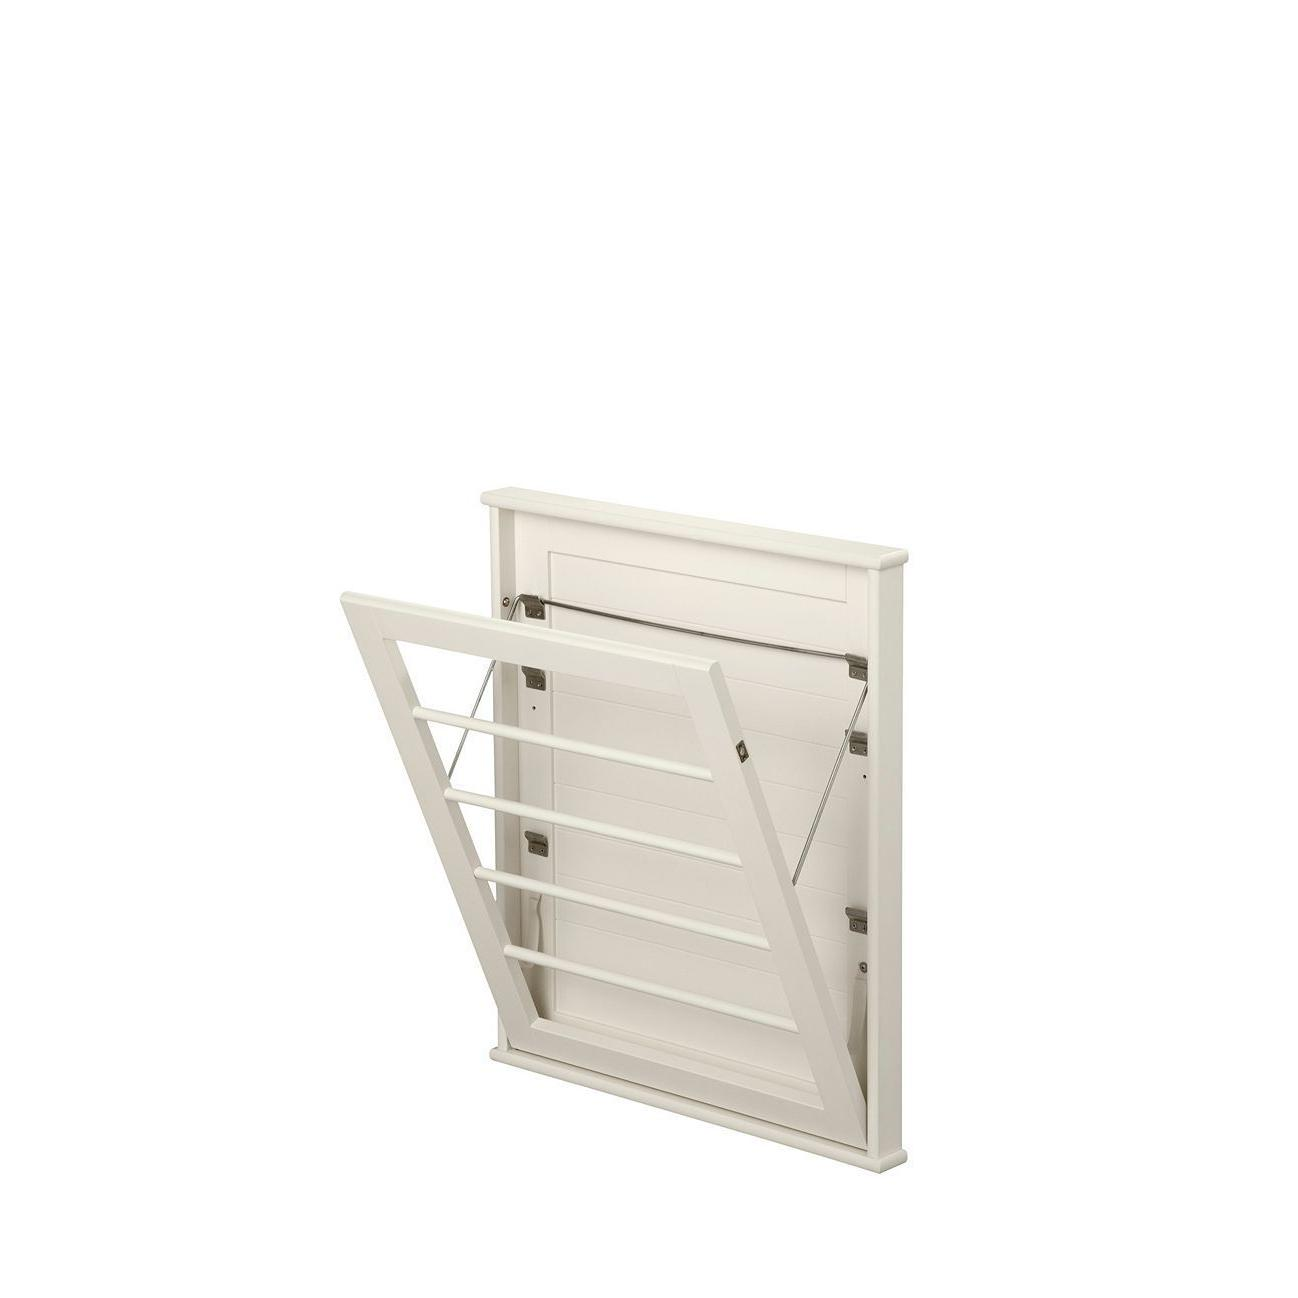 space saving wall mount drying rack small